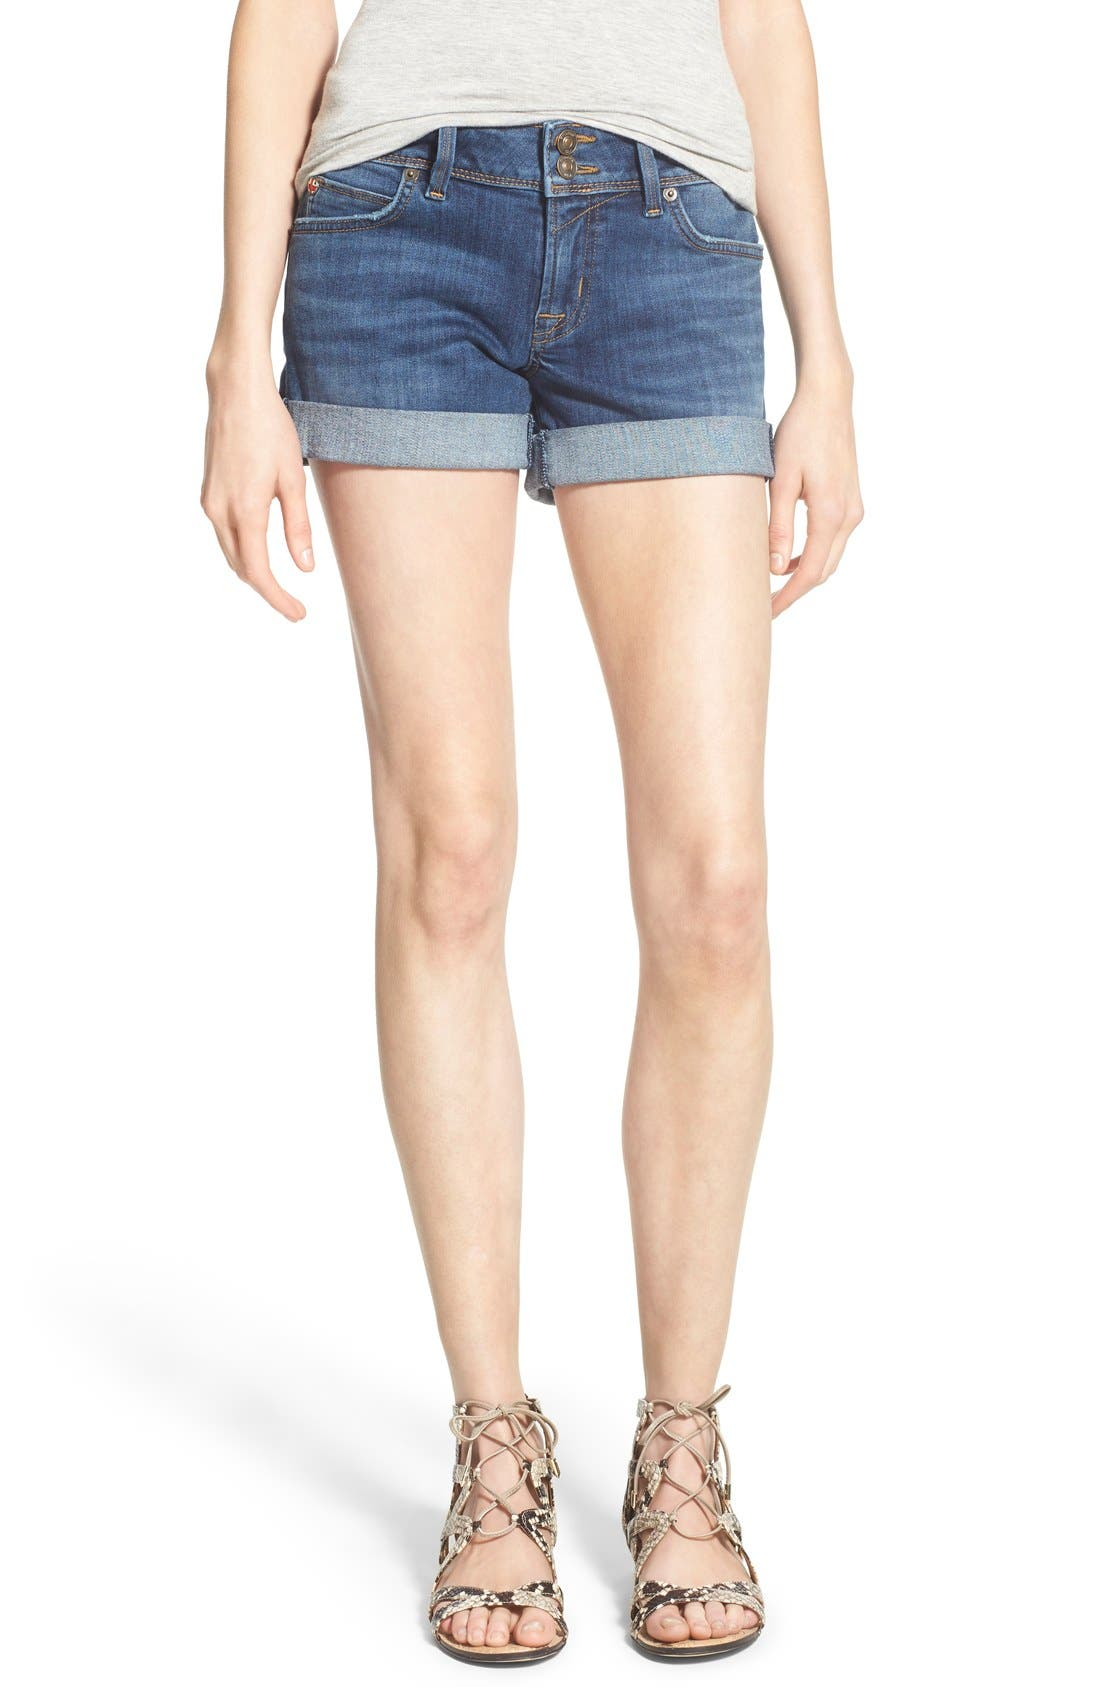 Main Image - Hudson Jeans 'Croxley' Cuffed Denim Shorts (Advantageous)